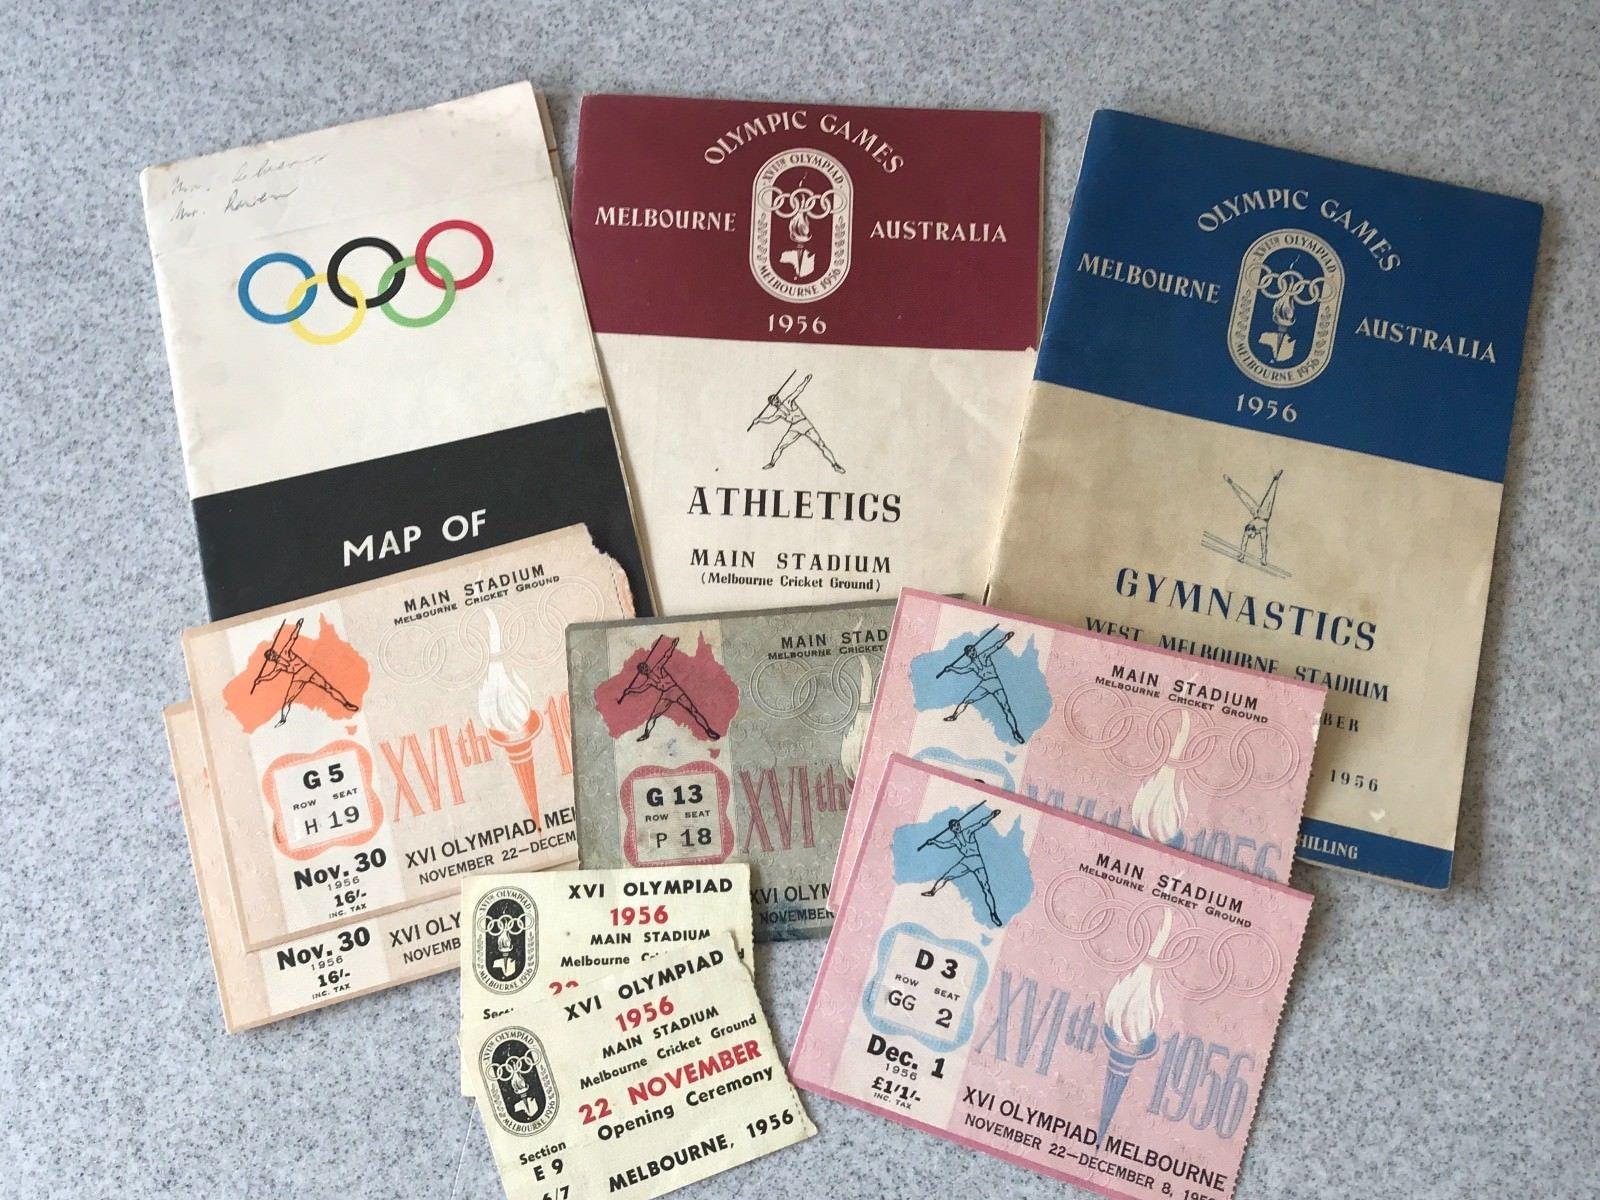 1956 MELBOURNE OLYMPICS MEMORABILIA Olympics